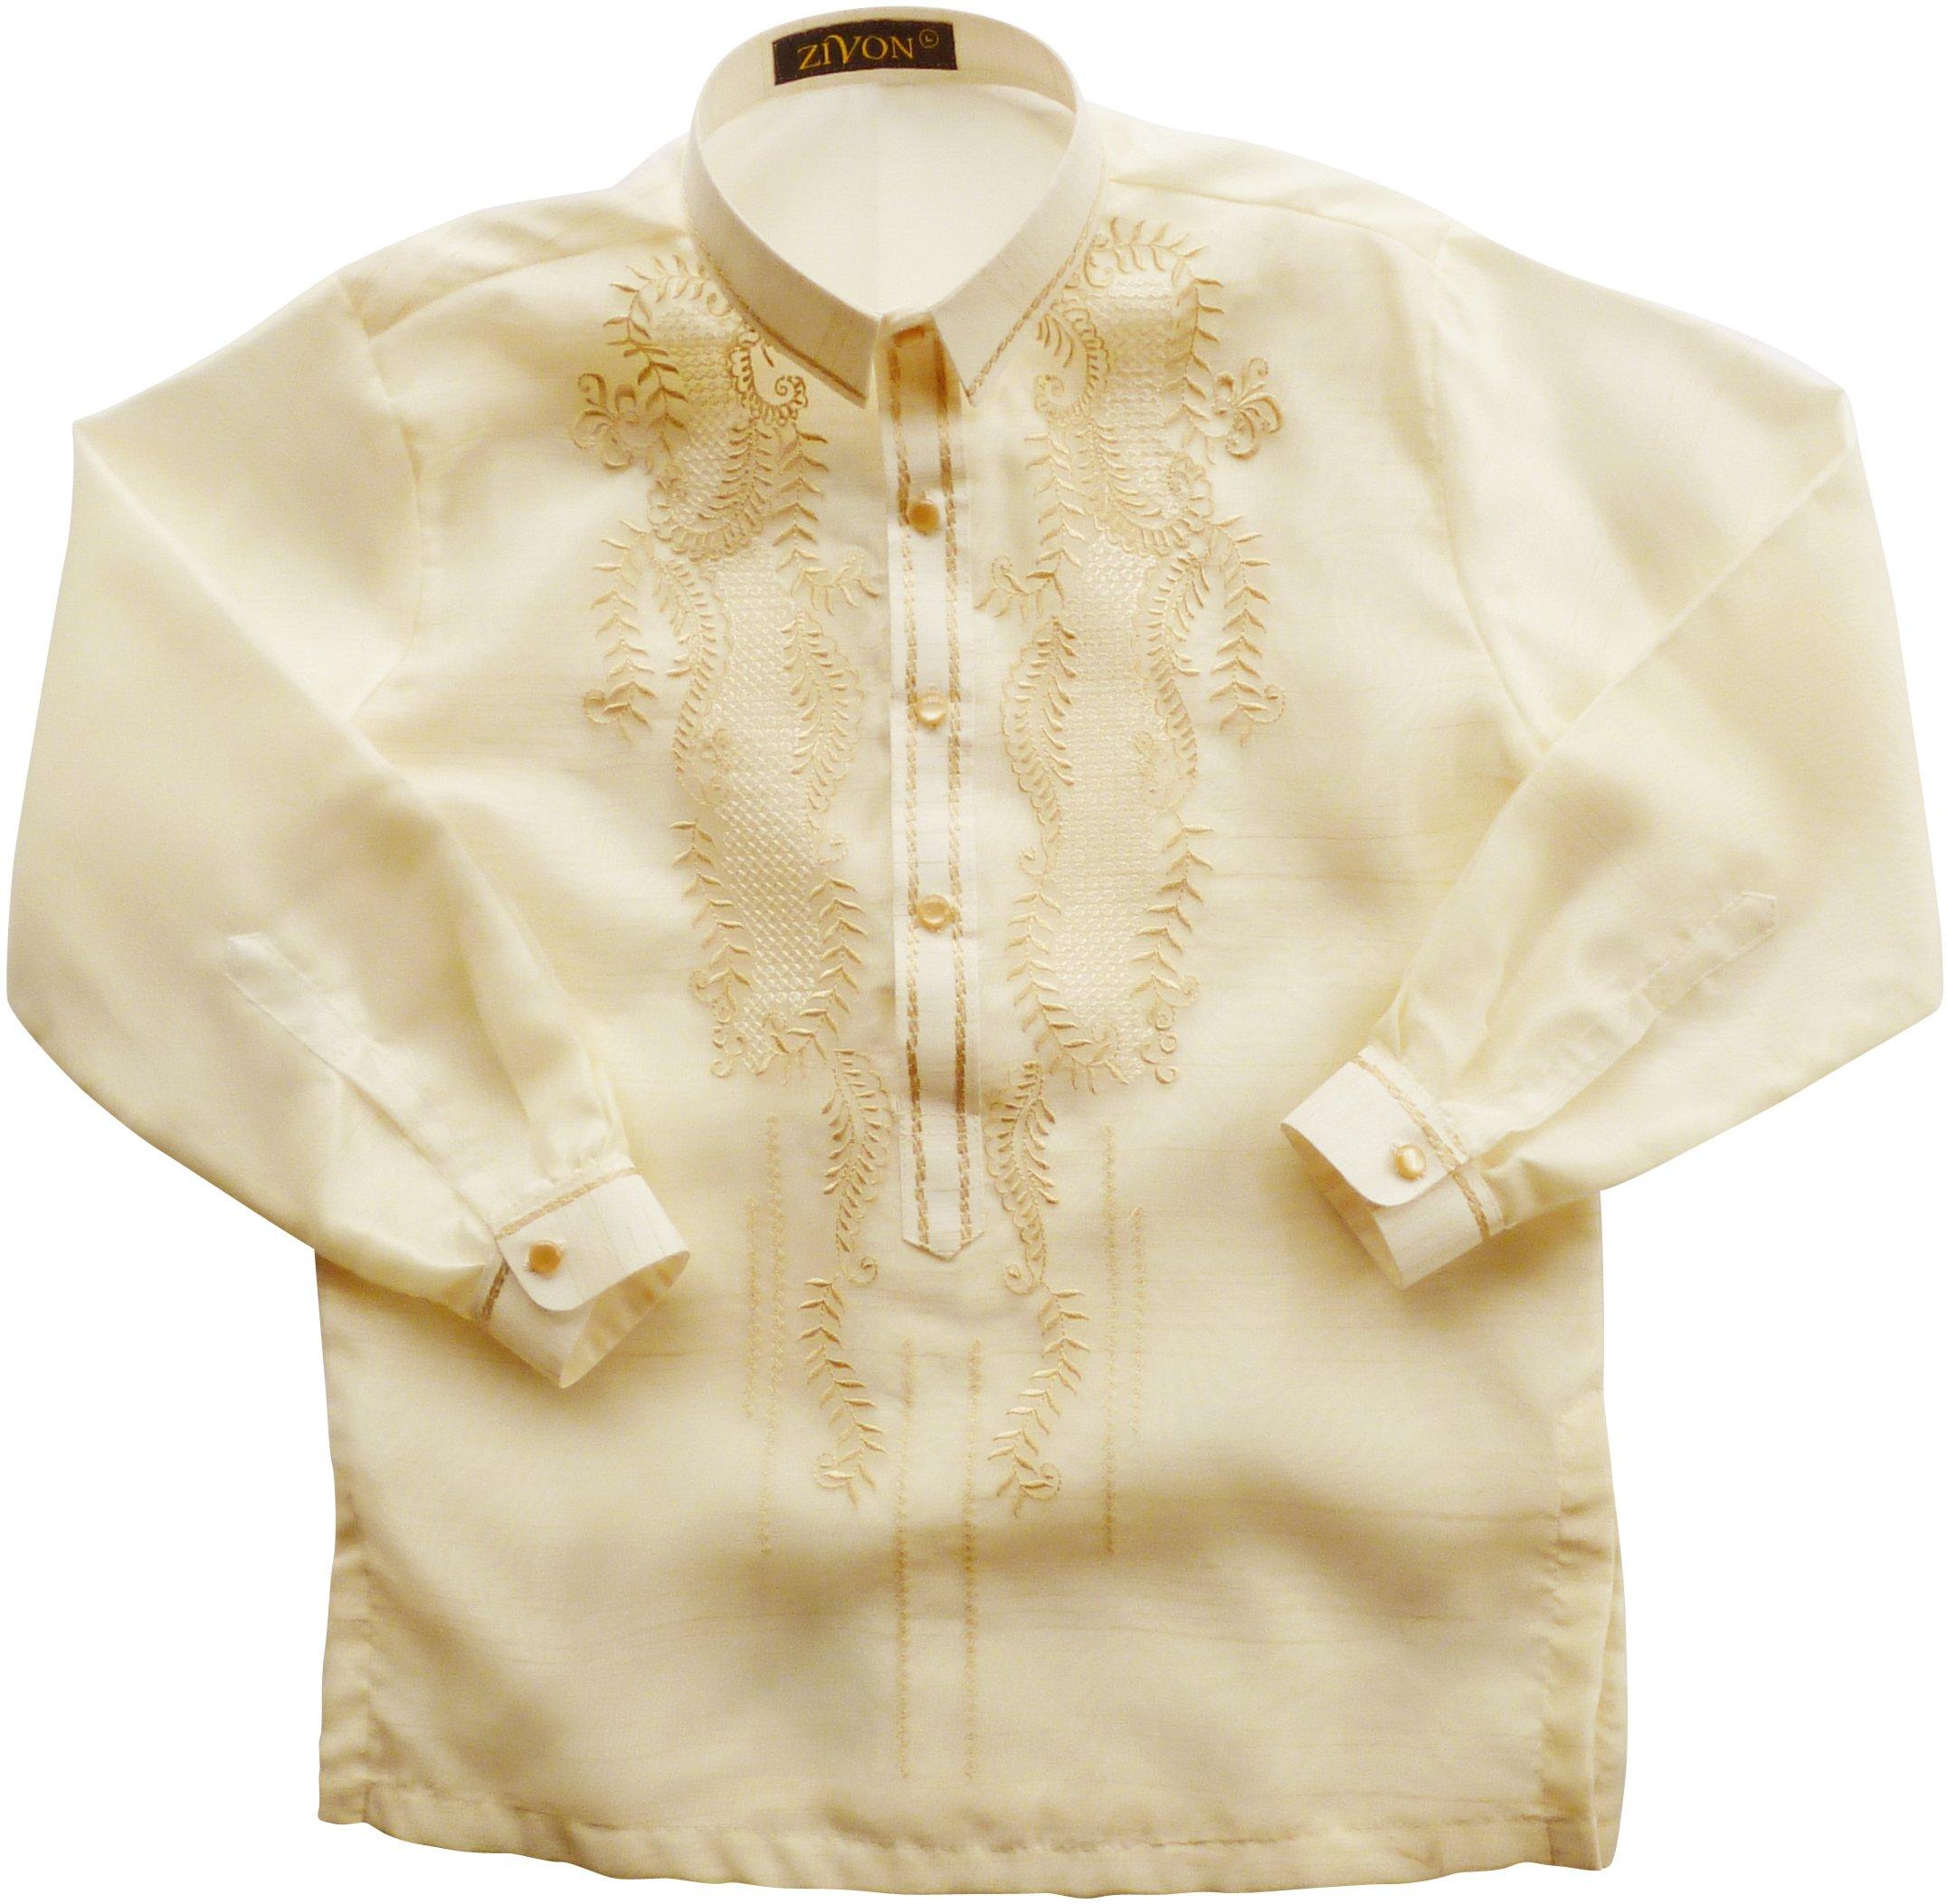 Zivon BOB001 Barong Tagalog for Boys Filipino Dress Shirt with Lining (Kids Size Large) by Zivon